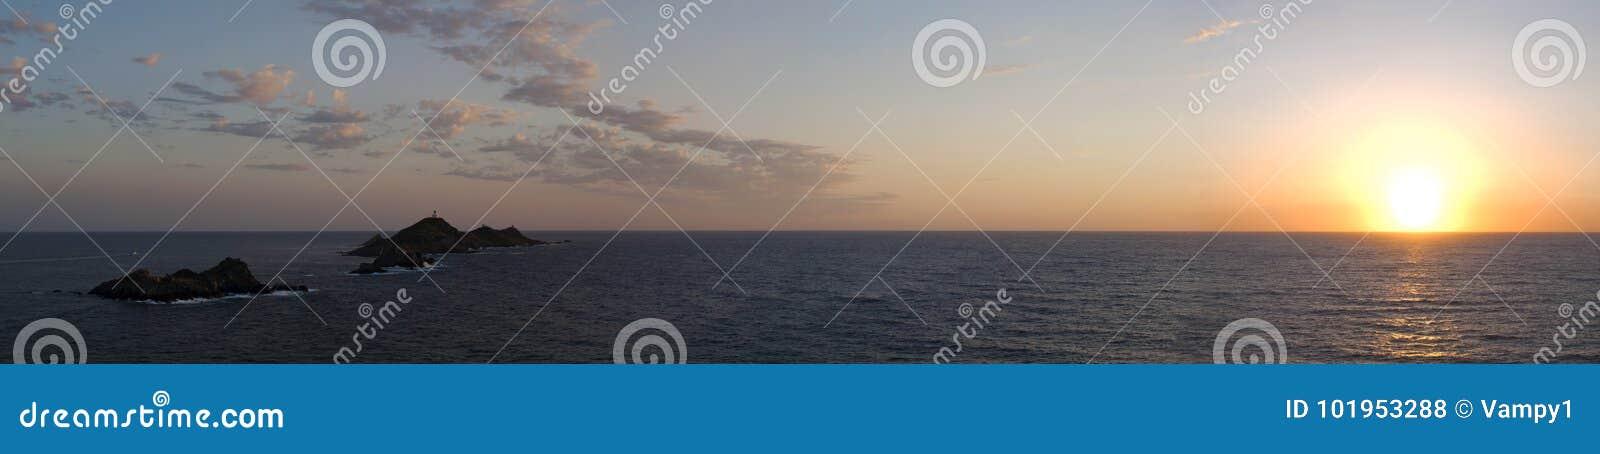 Iles Sanguinaires, Gulf of Ajaccio, Corsica, Corse, France, Europe, island